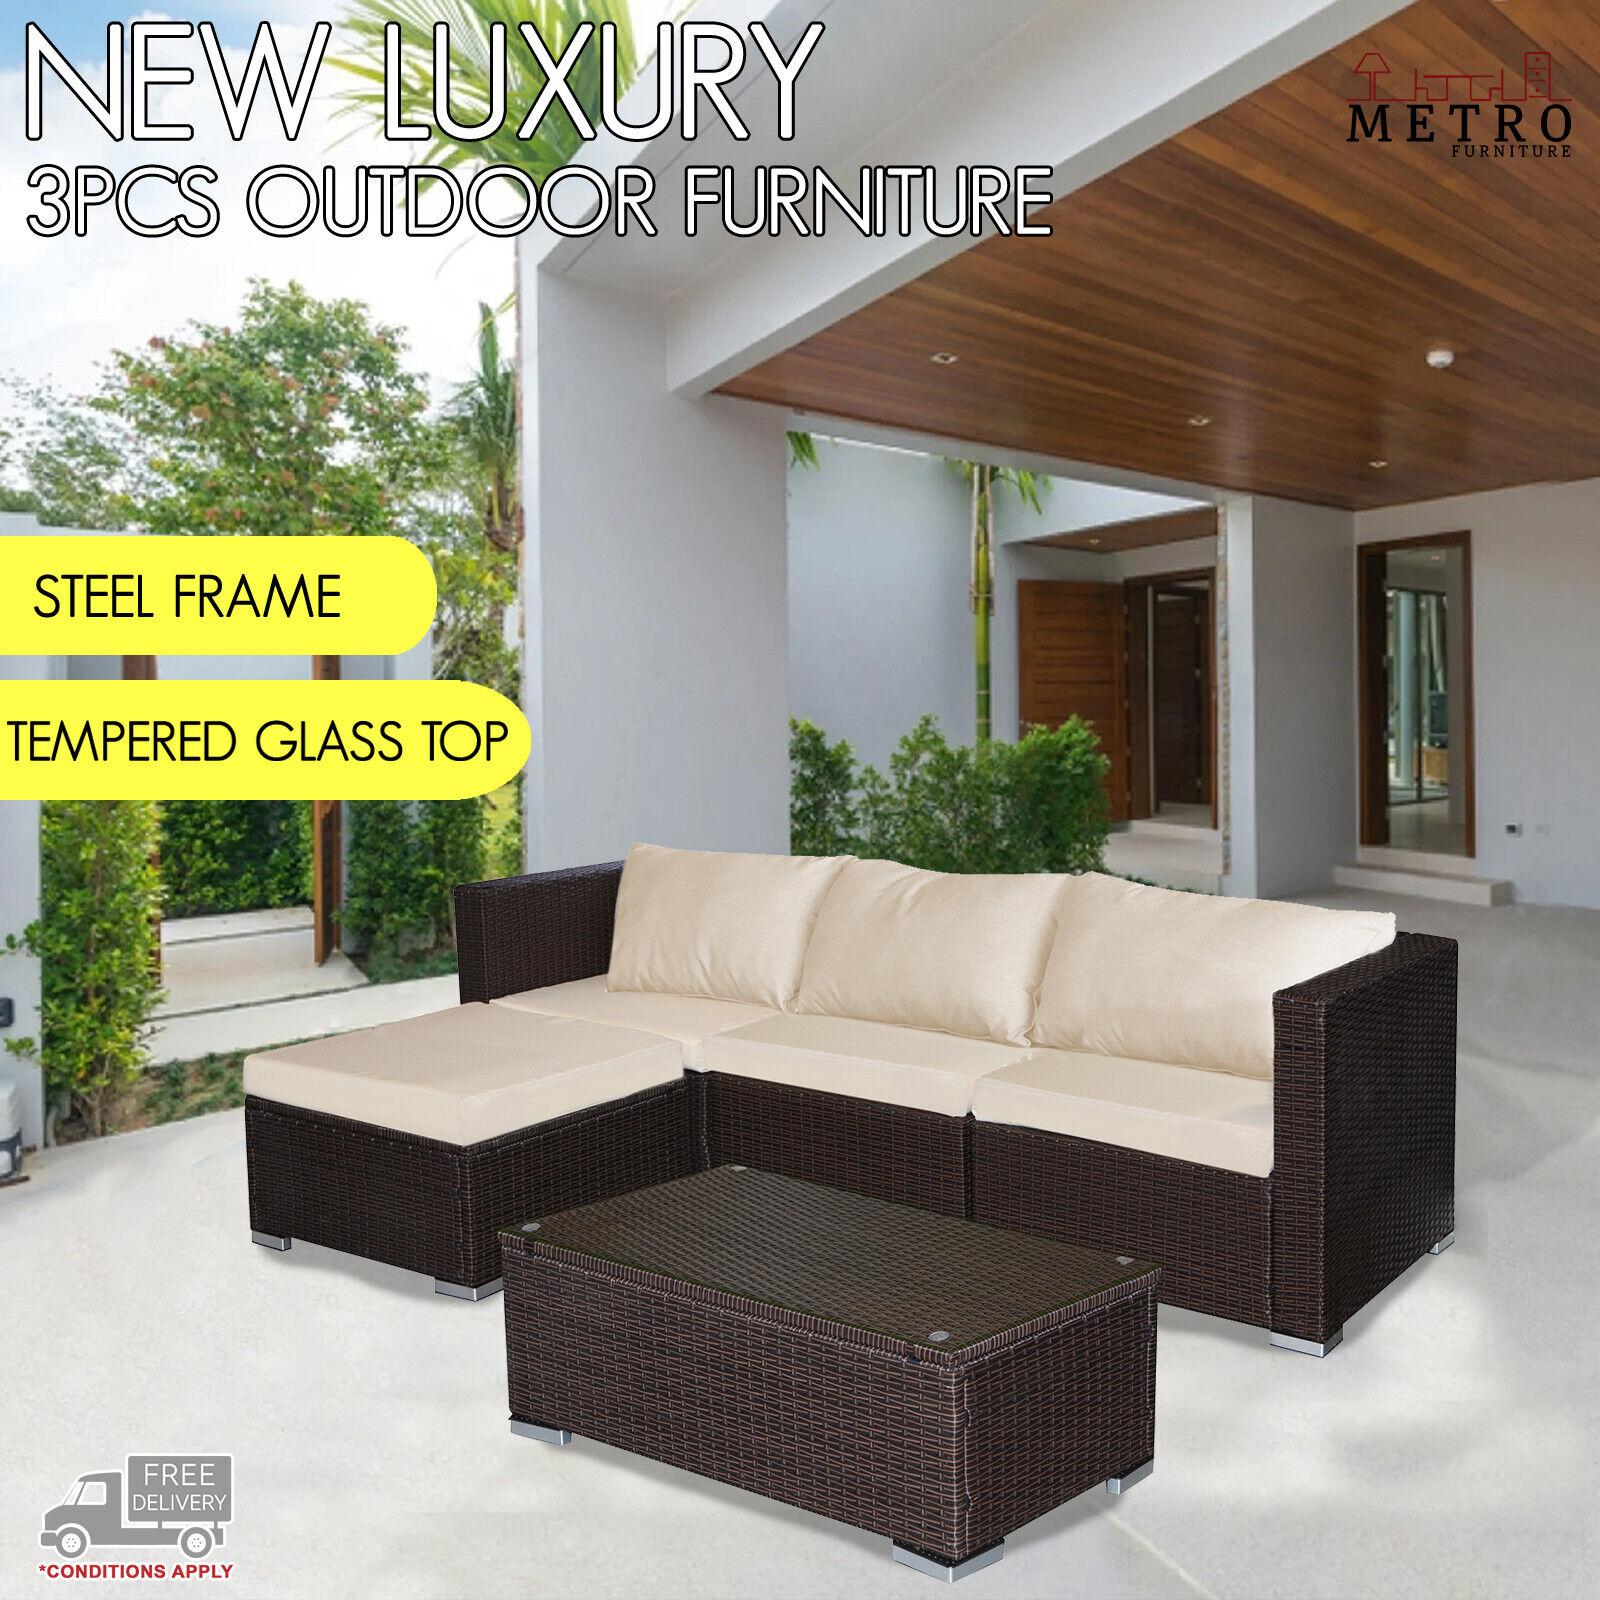 Garden Furniture - 3 Pcs Lounge Outdoor Furniture William Sofa Set Patio,Garden,Outdoor Brown